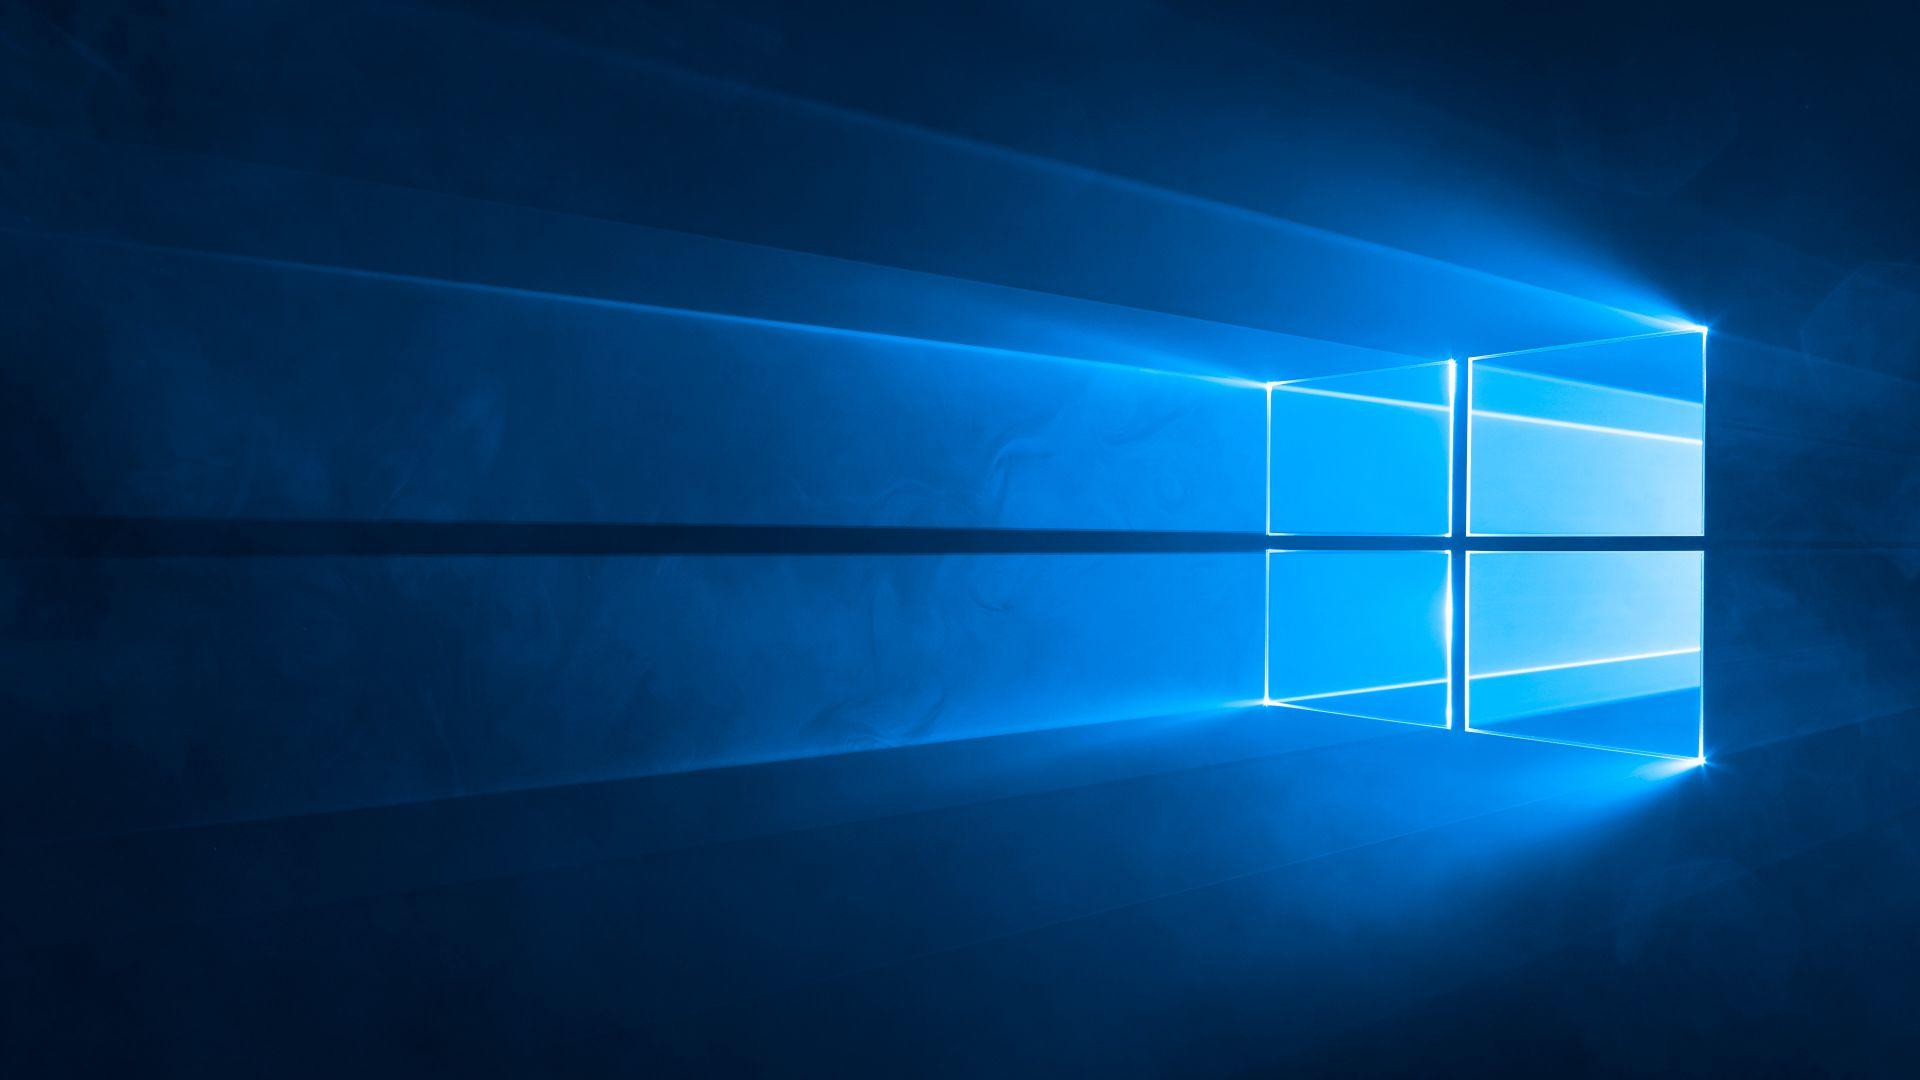 Wallpaper Windows 10 4k 5k Wallpaper Microsoft Blue Os 6992